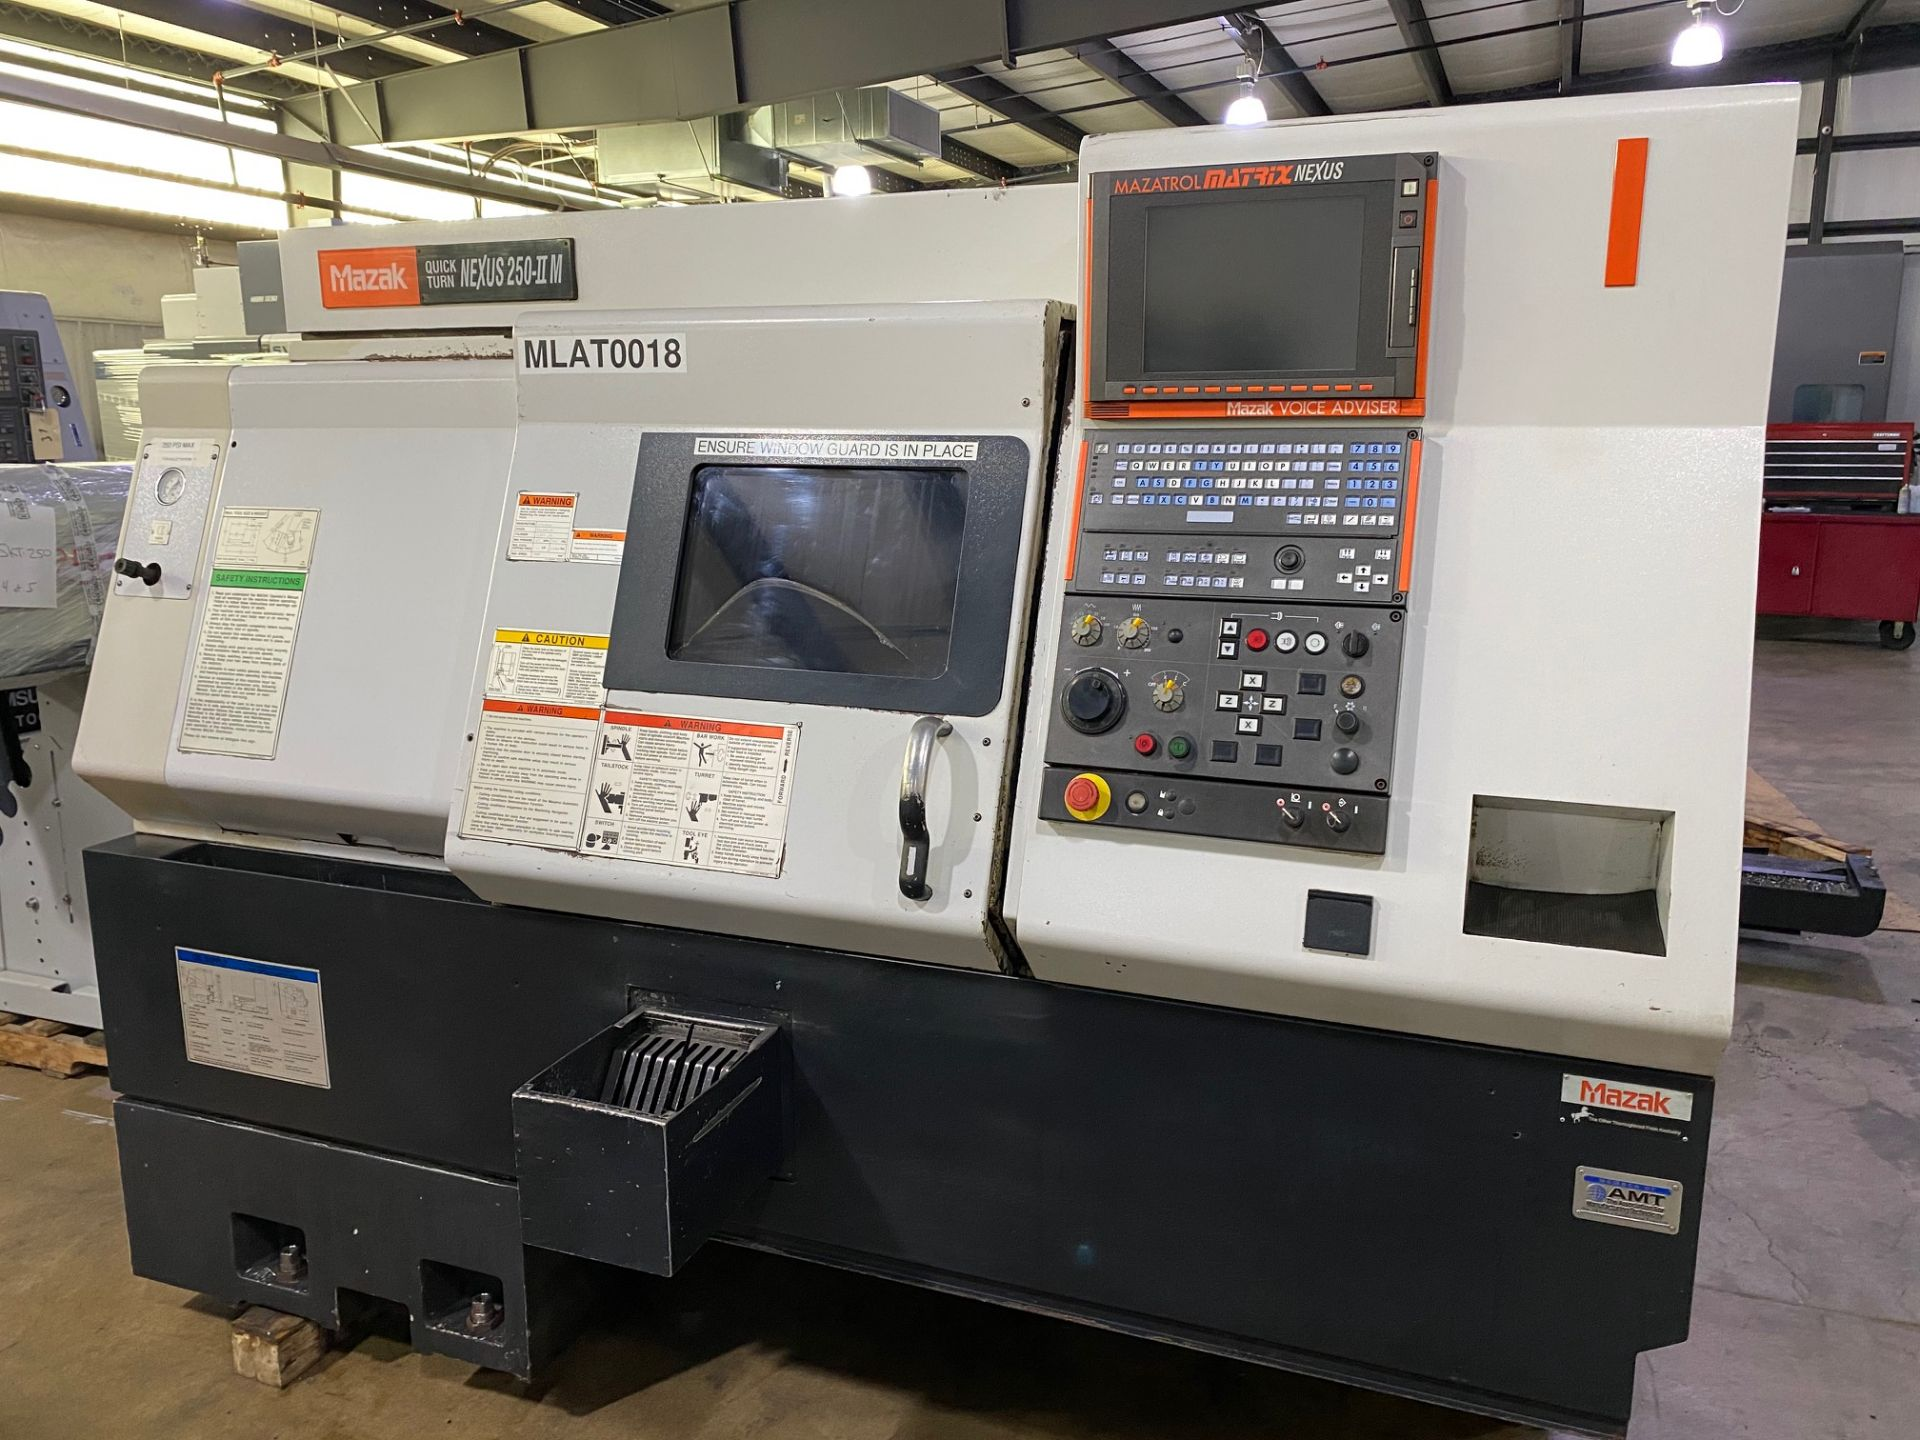 Lot 33 - Mazak Nexus QTN 250II-M CNC Turning Center